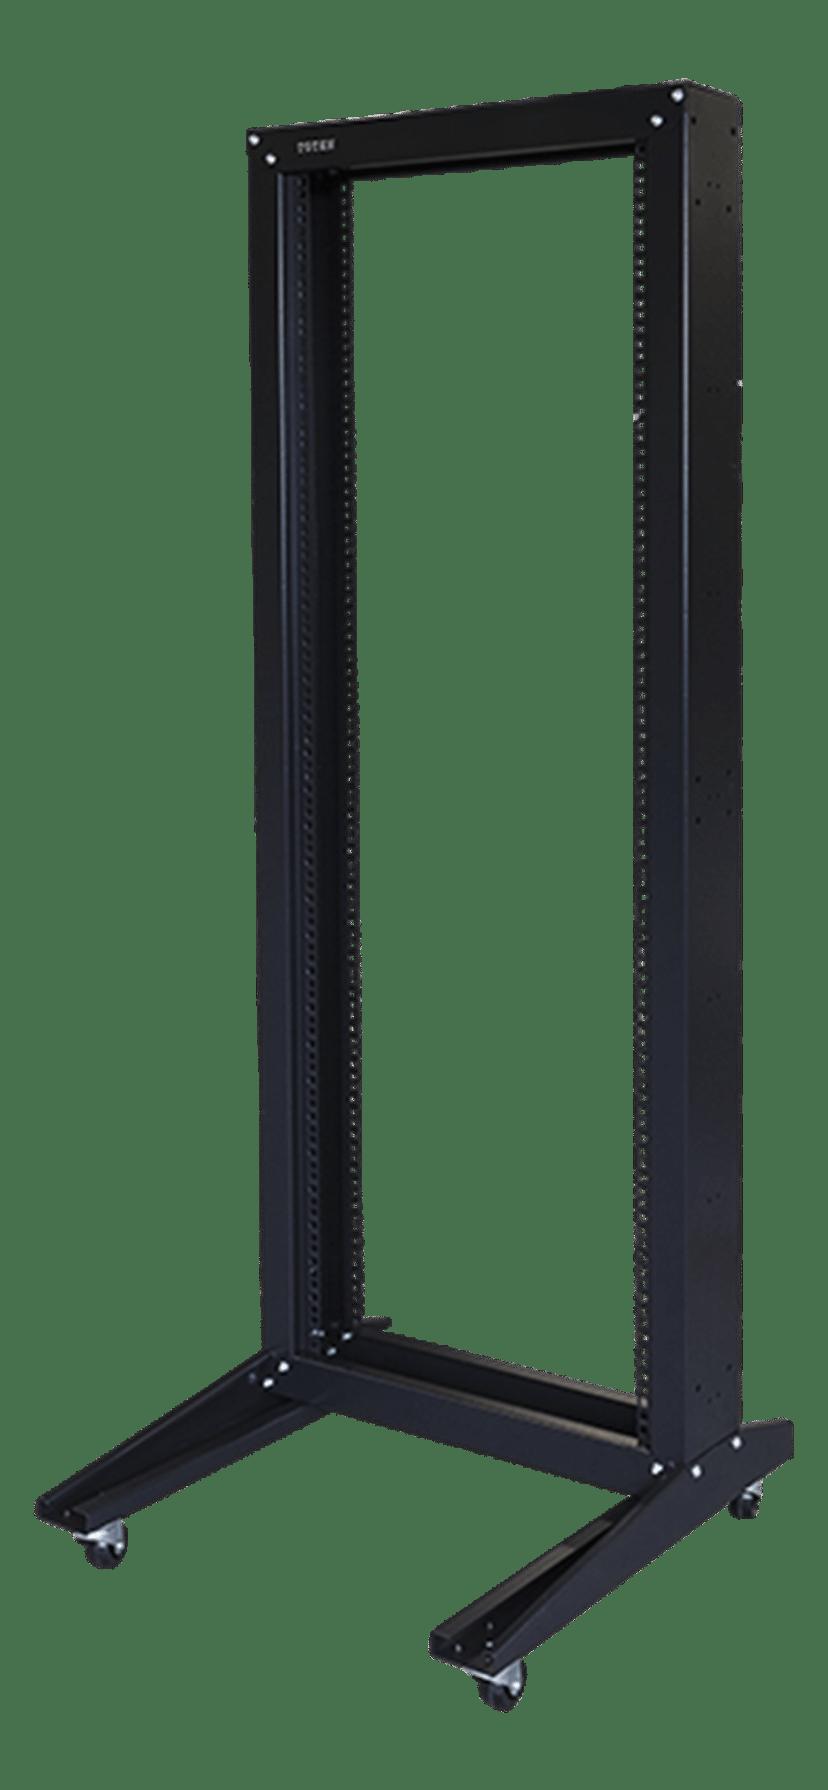 "Toten 19"" Golvstativ Open Frame 32U 600X600 Hjul Svart"